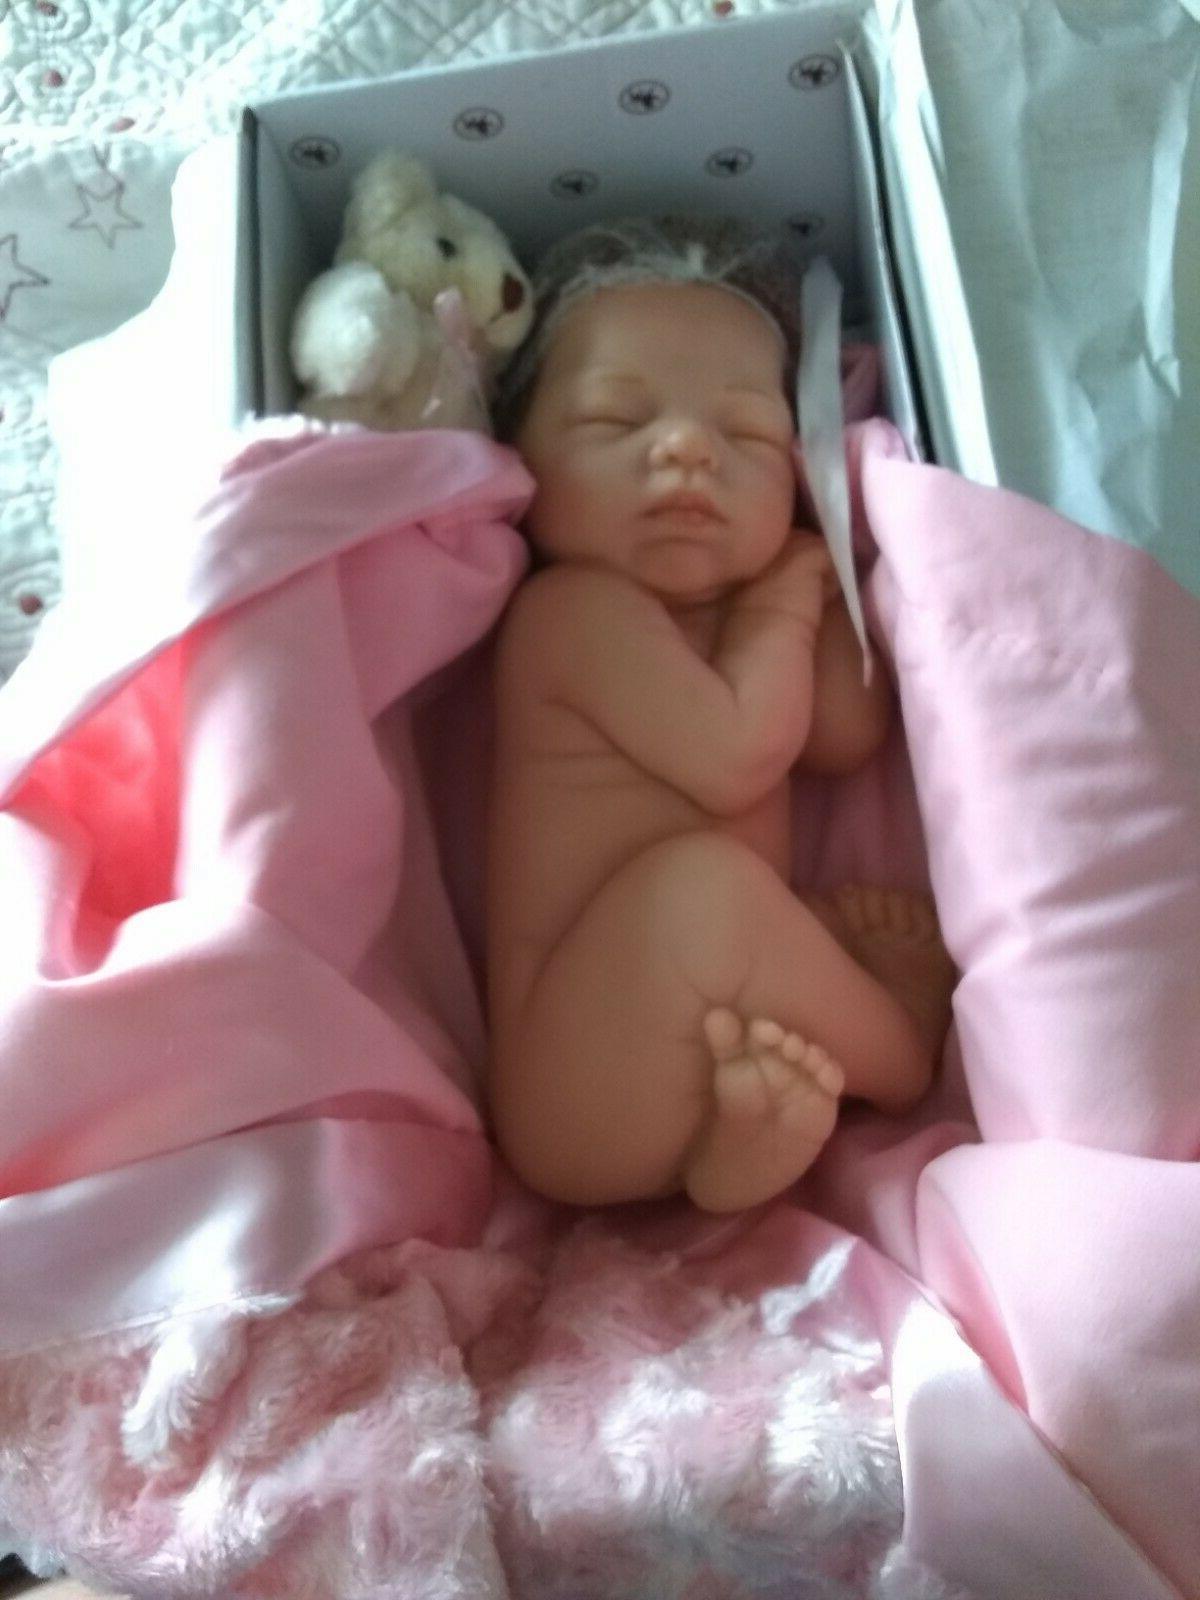 The baby girl